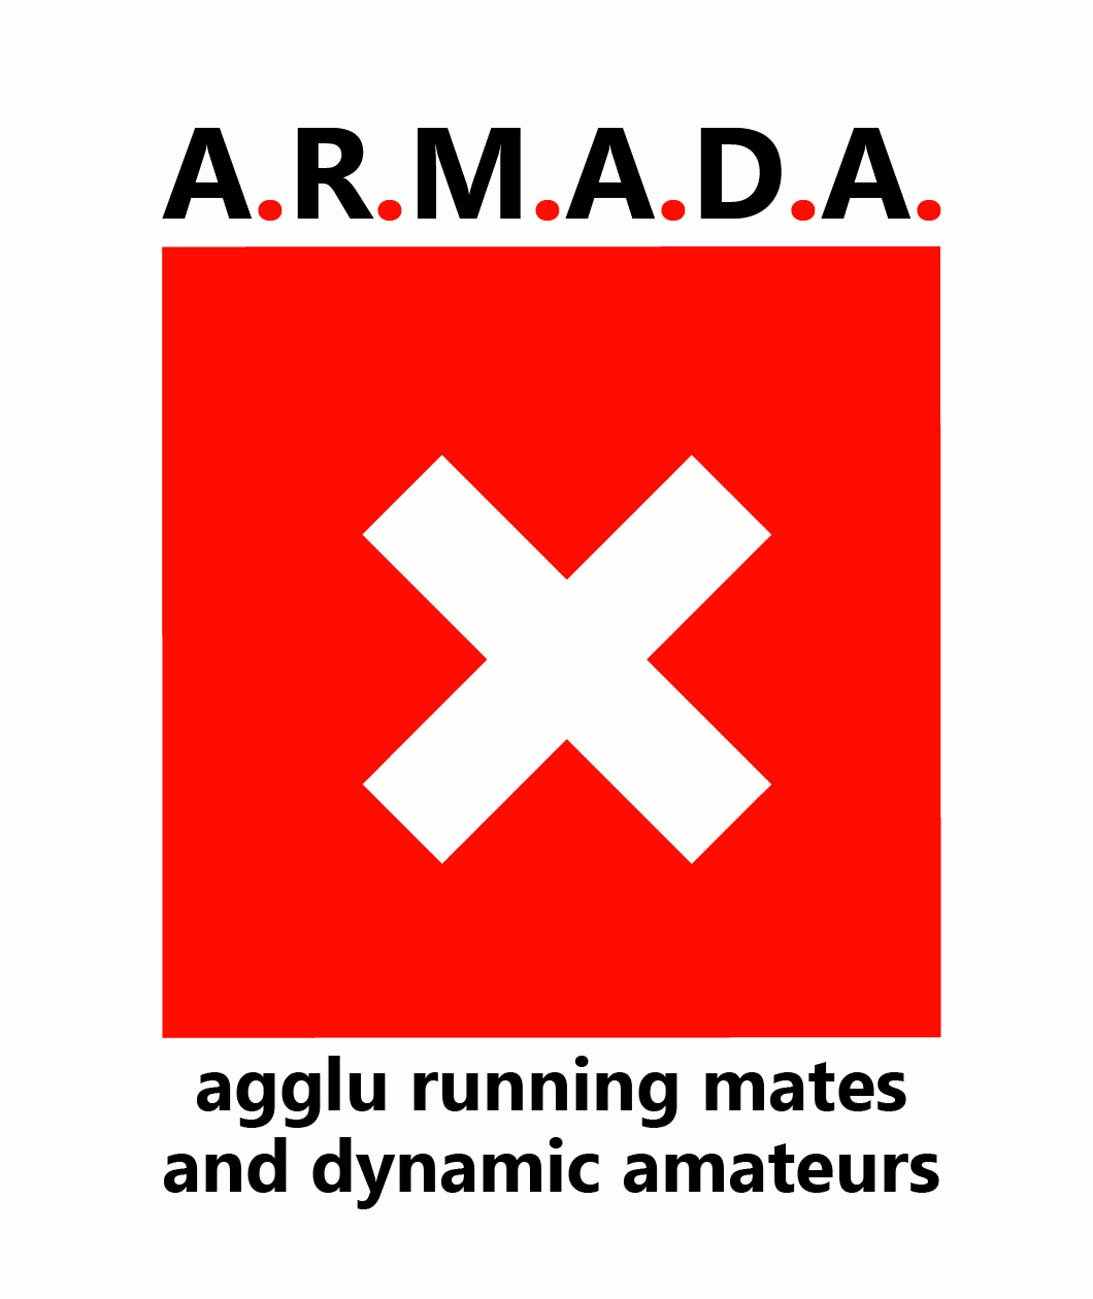 /images/com_odtatierkdunaju/teams/2016_A-R-M-A-D-A-.jpg